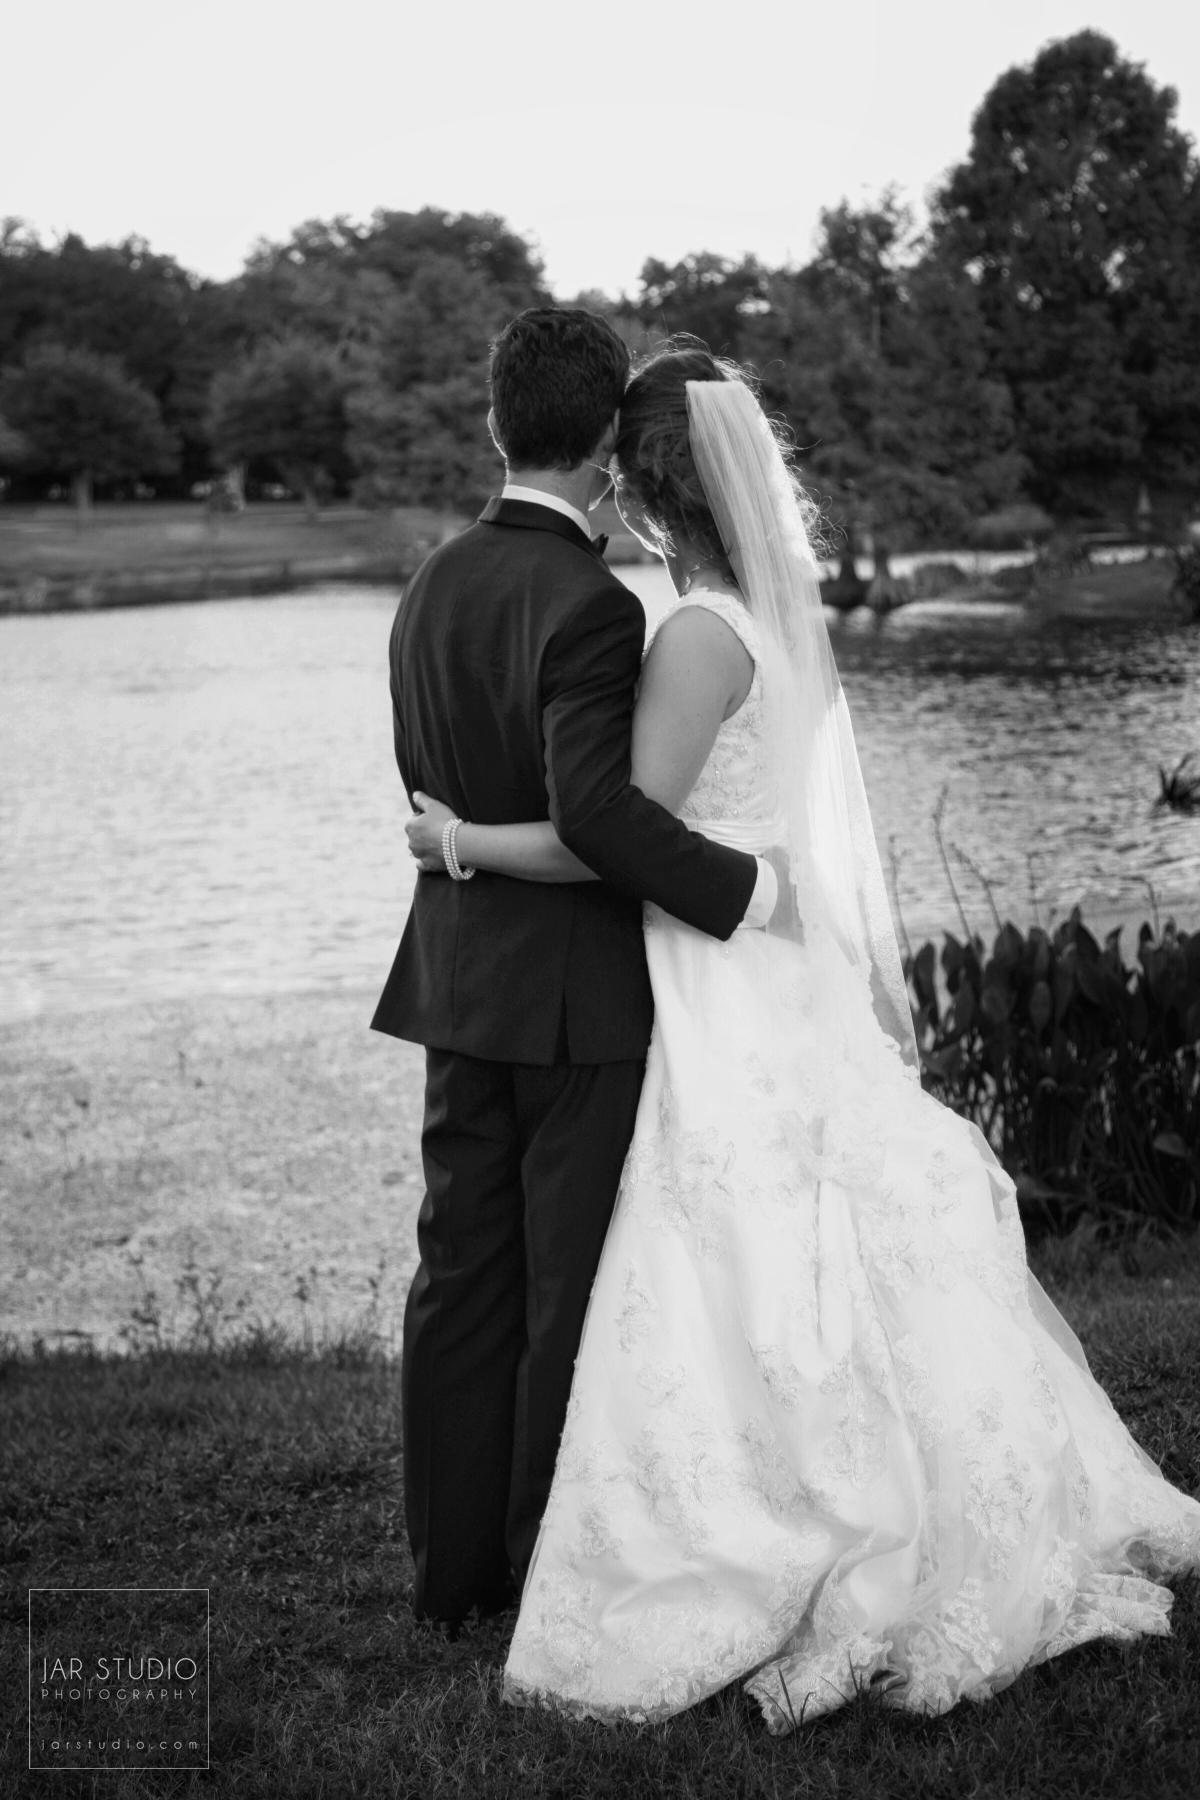 27-romantic-orlando-wedding-sunset-jarstudio-photography.JPG